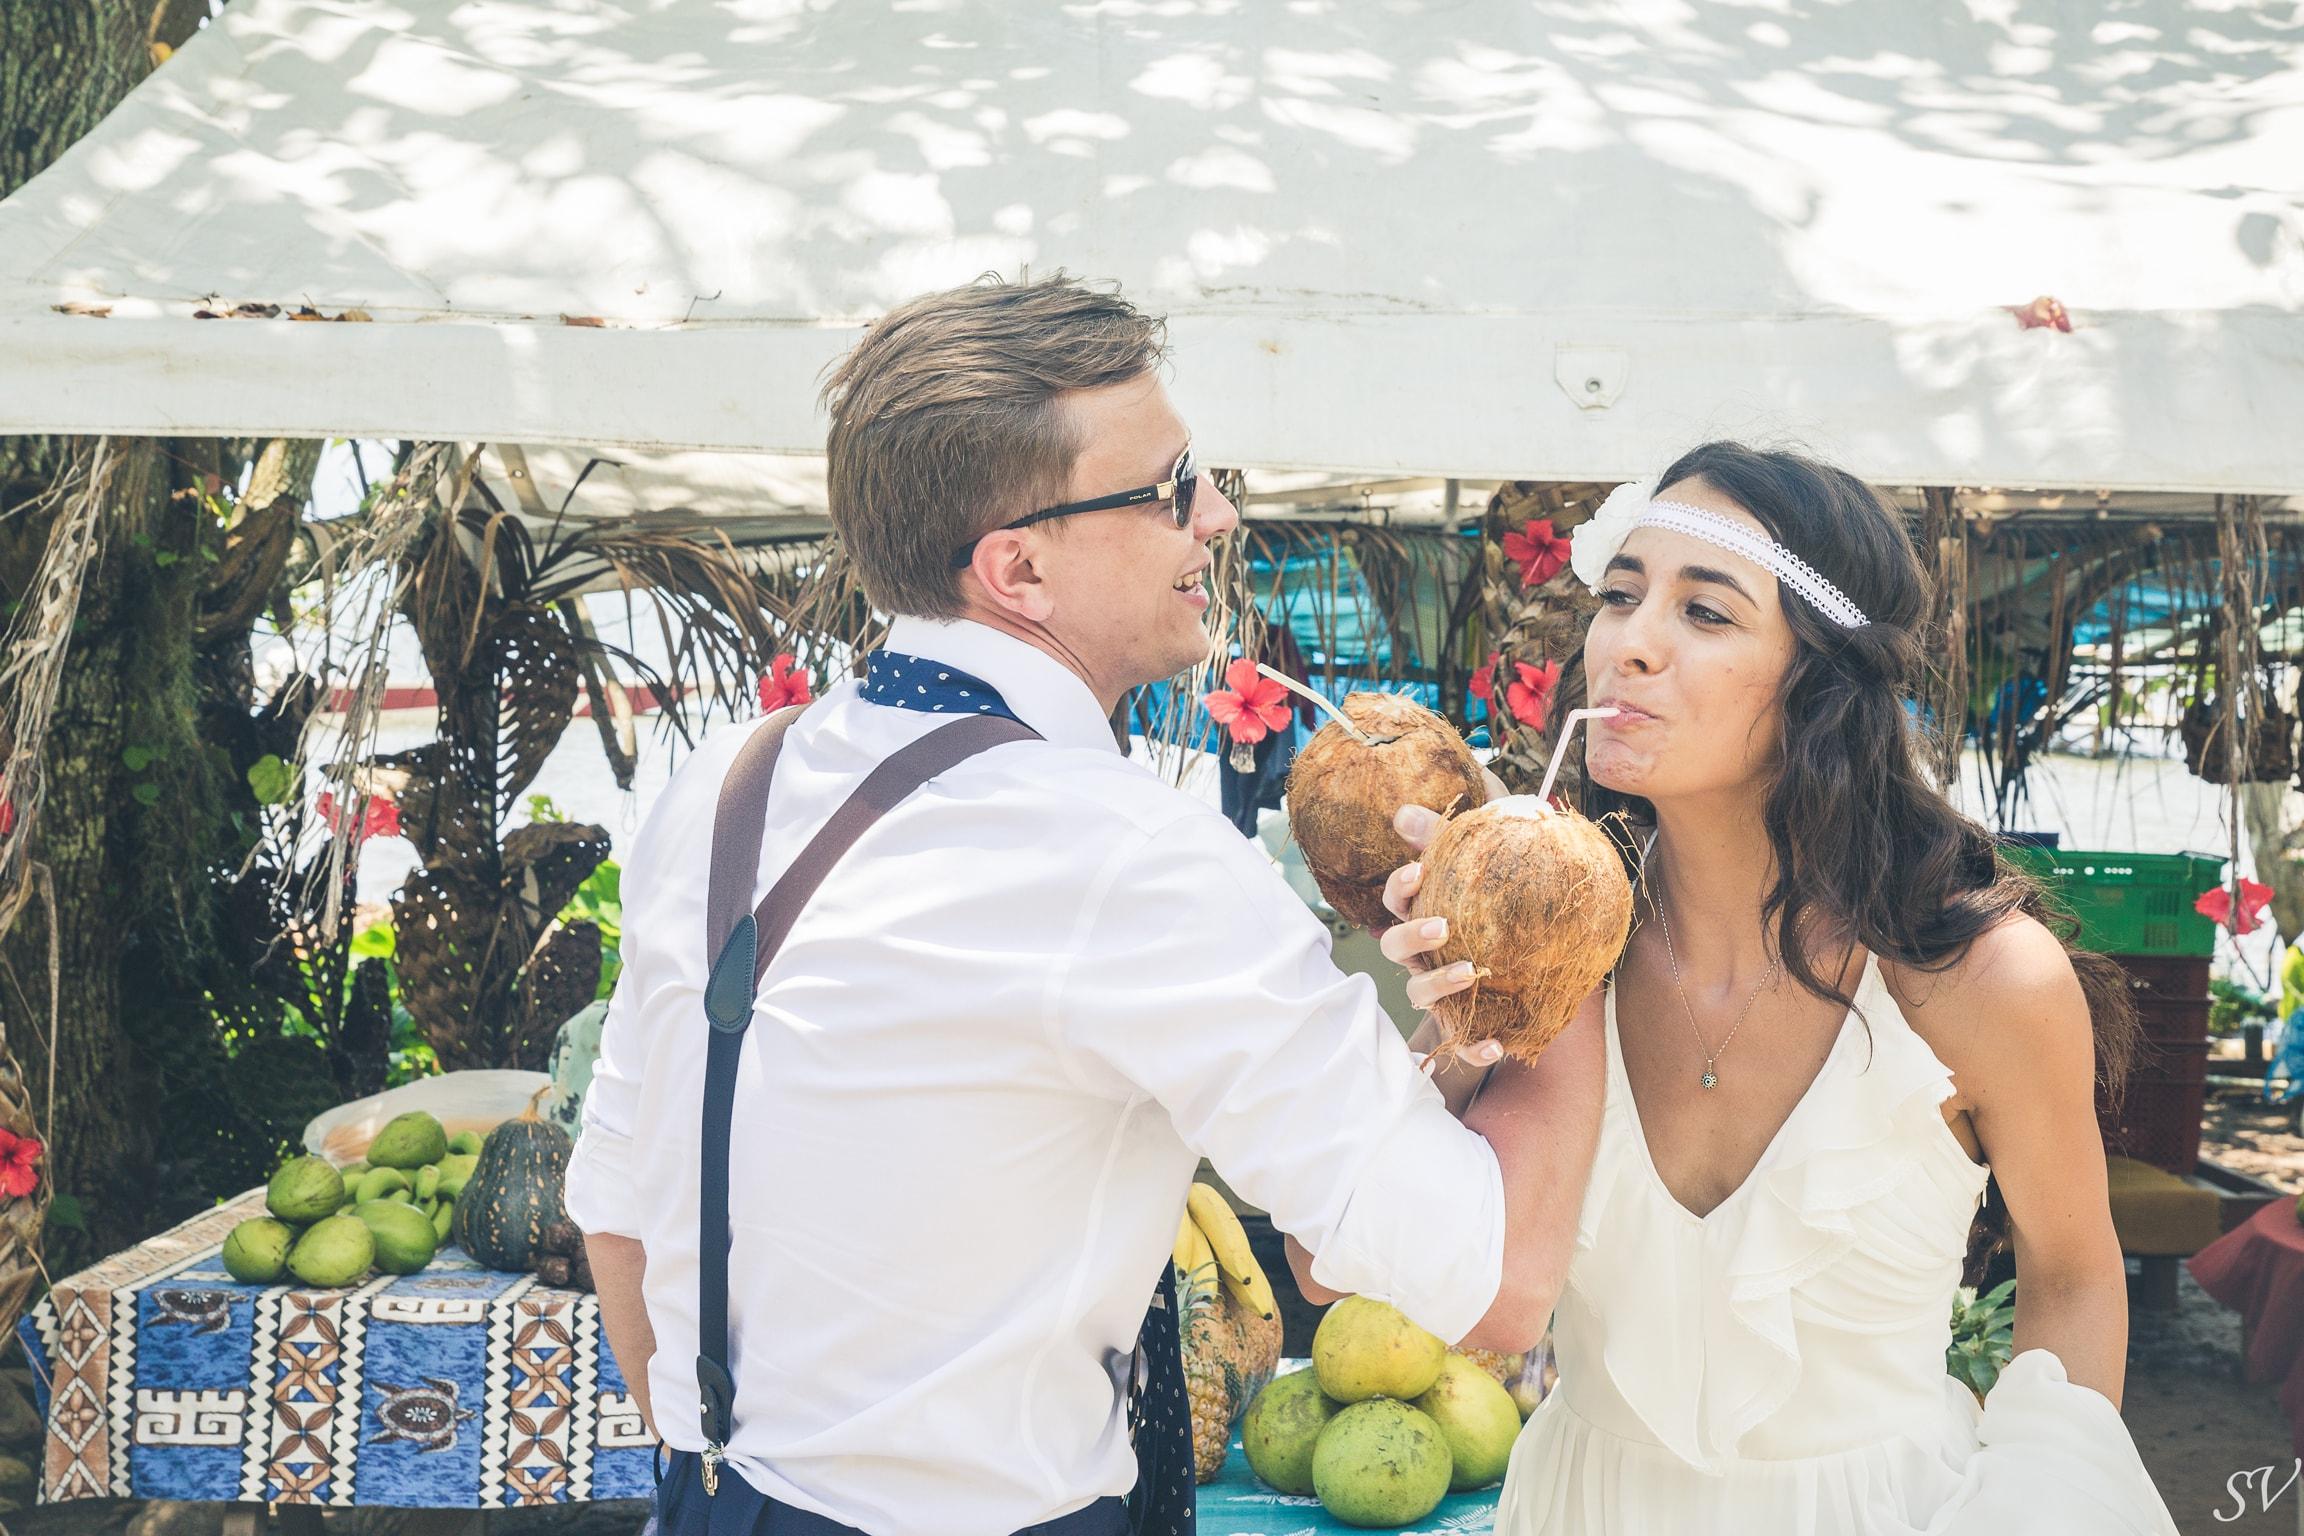 Coconut celebration for a destination wedding